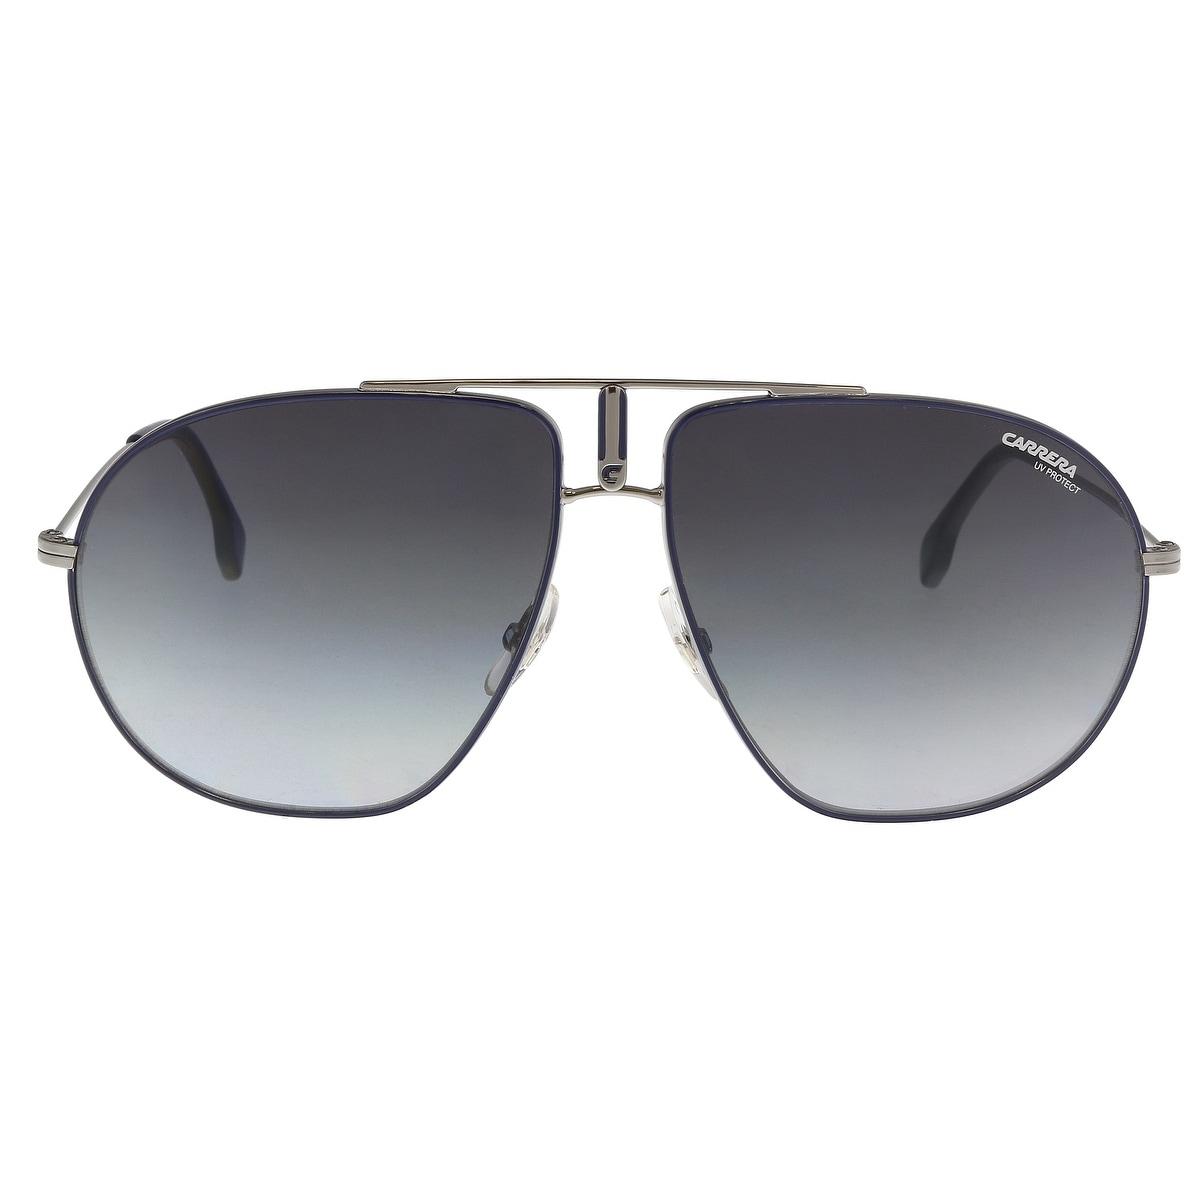 dd542ac74 Shop Carrera BOUNDS 0DTY-90 Blue Ruthenium Aviator Sunglasses - 60 ...